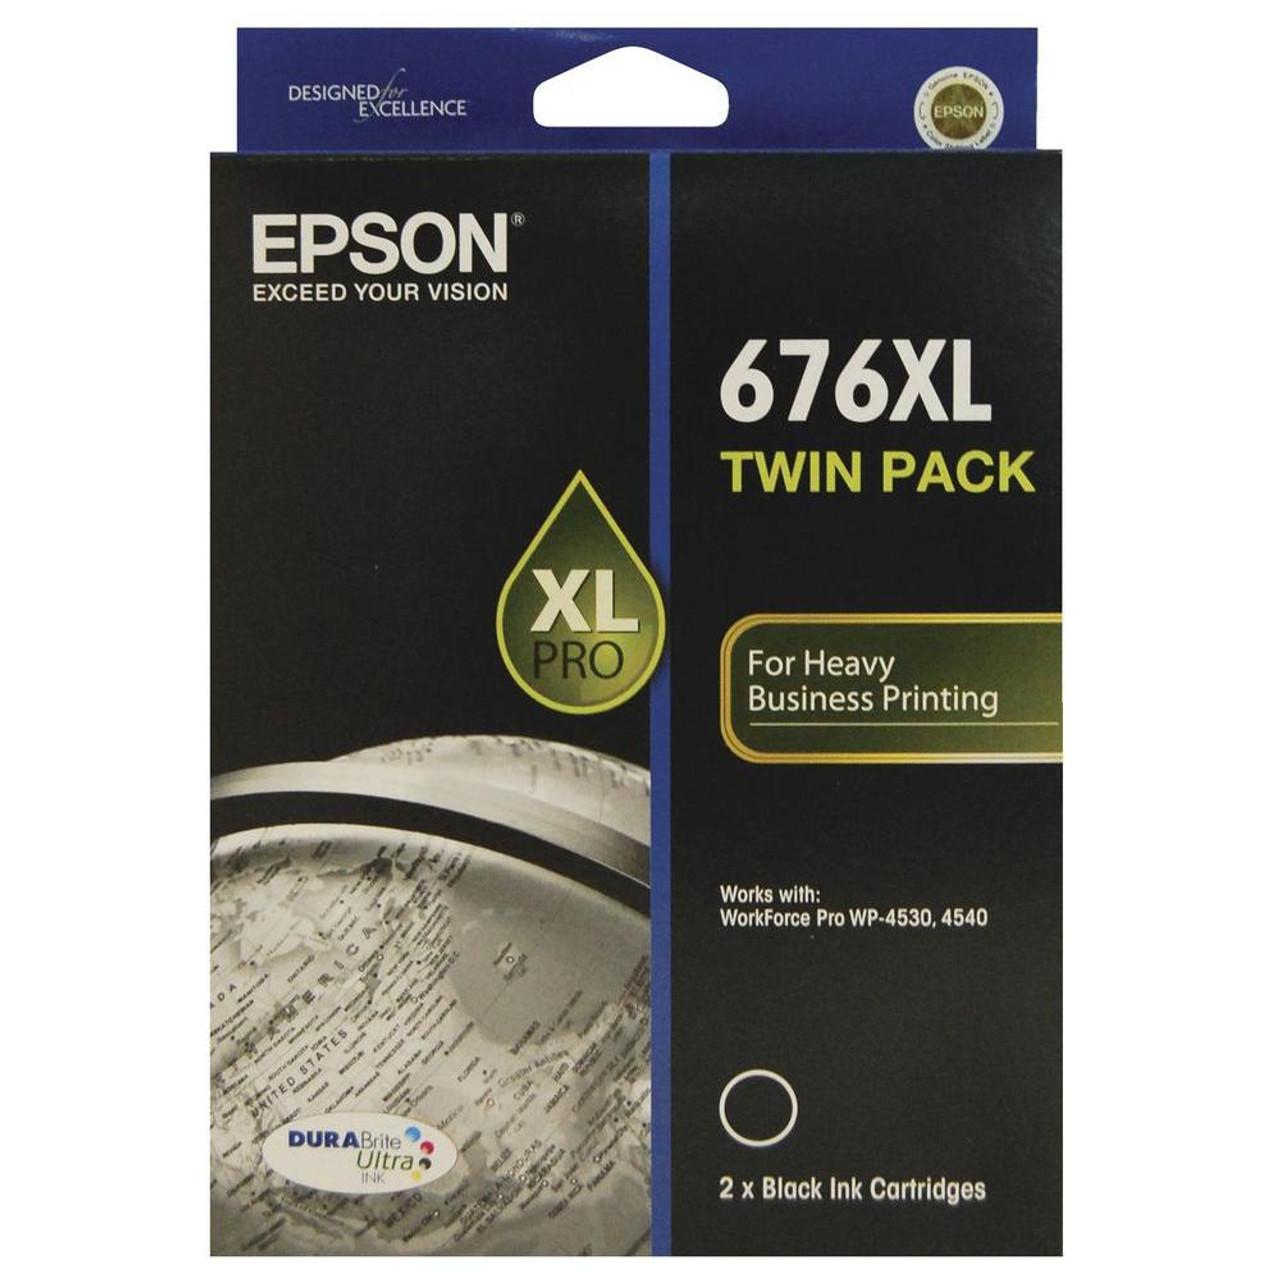 EPSON C13T676194 676XL HIGH YIELD INK CARTRIDGE DURABRITE ULTRA TWIN PACK  BLACK